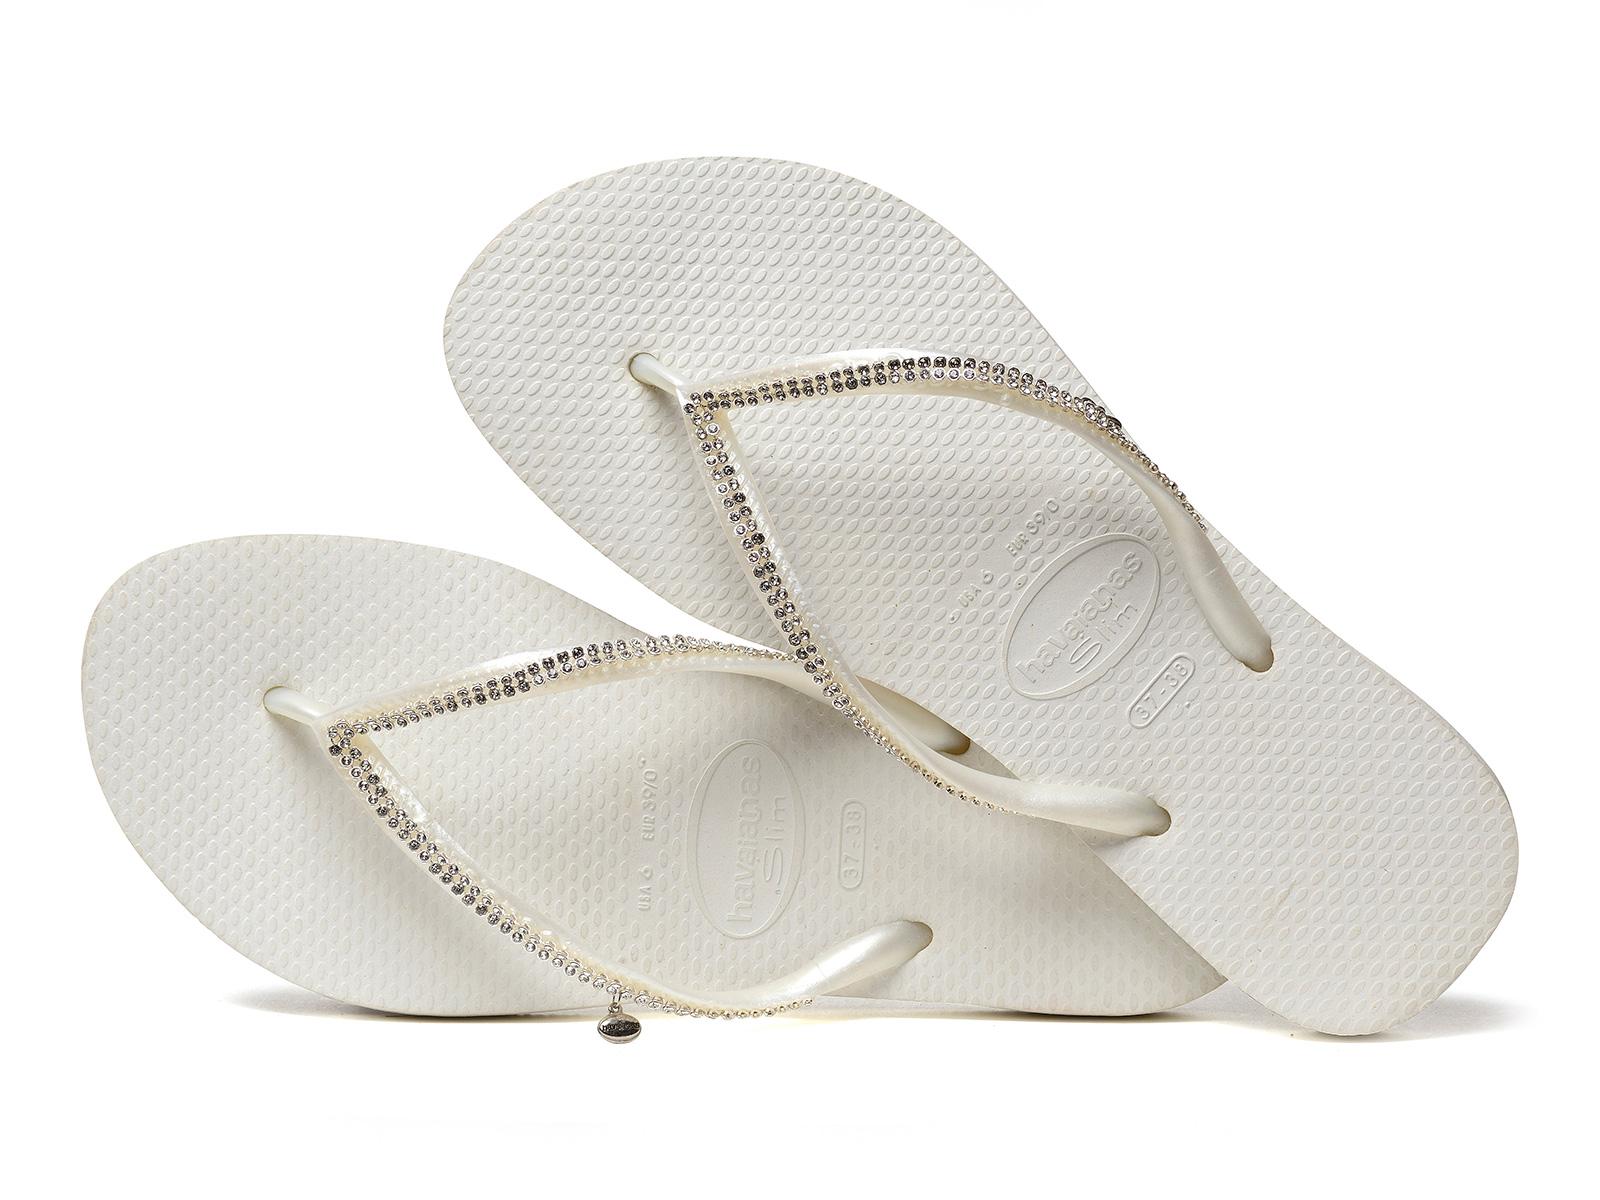 287fa4a8d ... White flip-flops with Swarovski crystals - Slim Crystal Mesh Sw White  ...